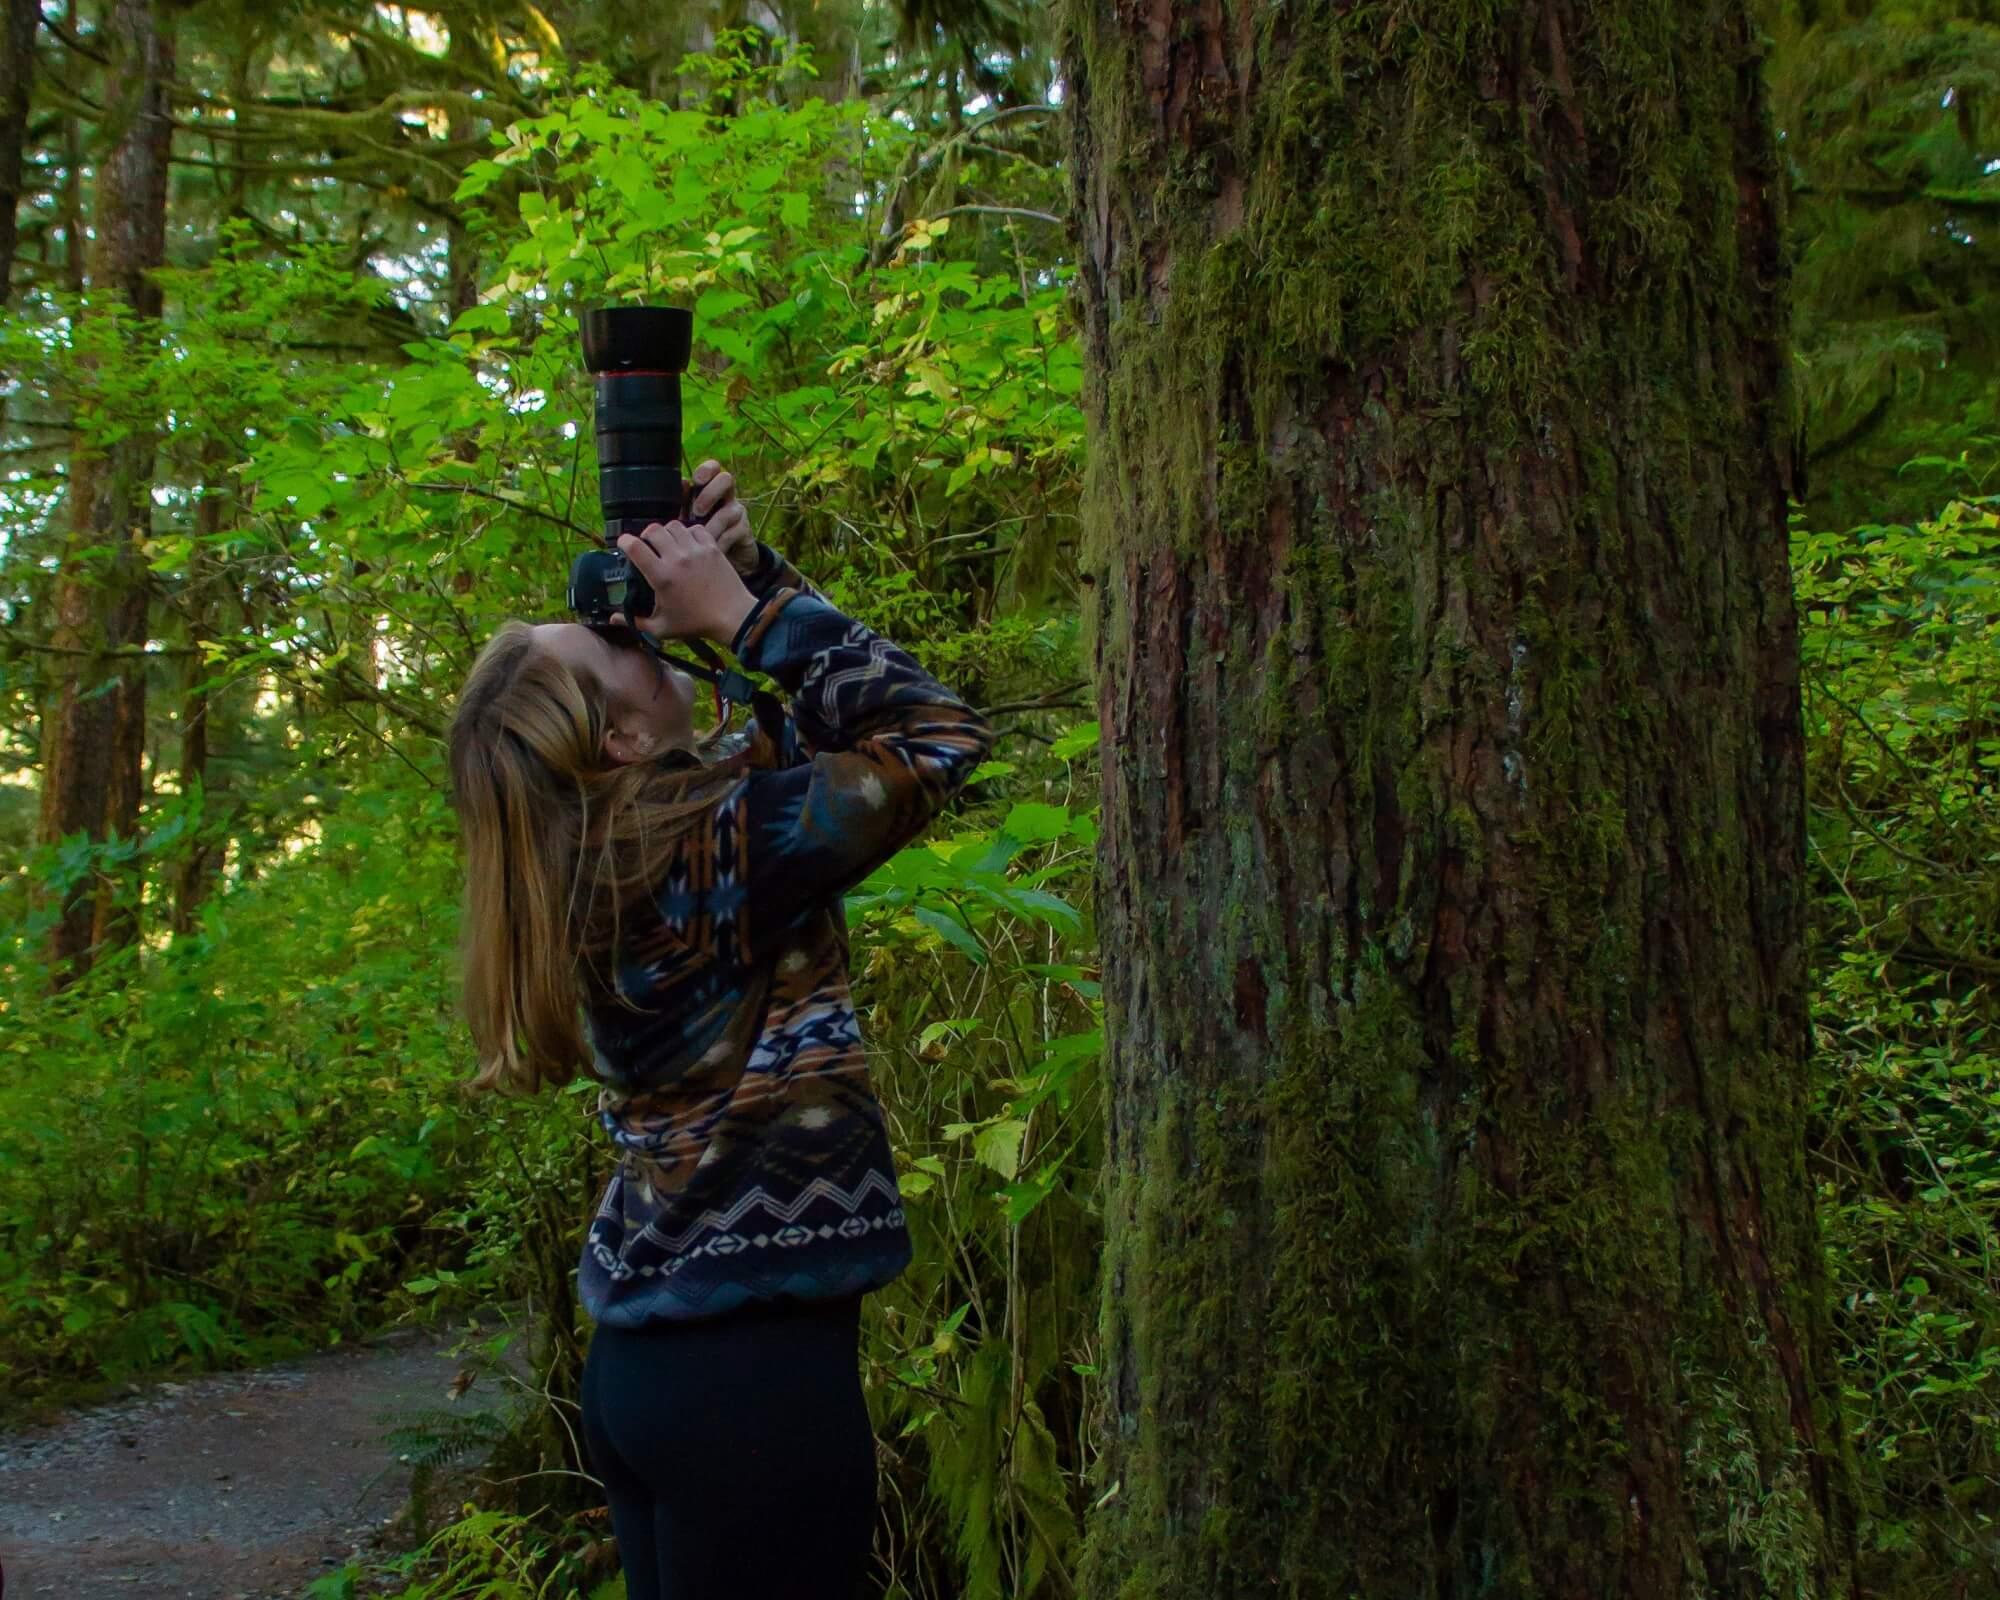 https://www.kawanti.com/wp-content/uploads/2018/10/Photo-shooting-up-tree.jpg